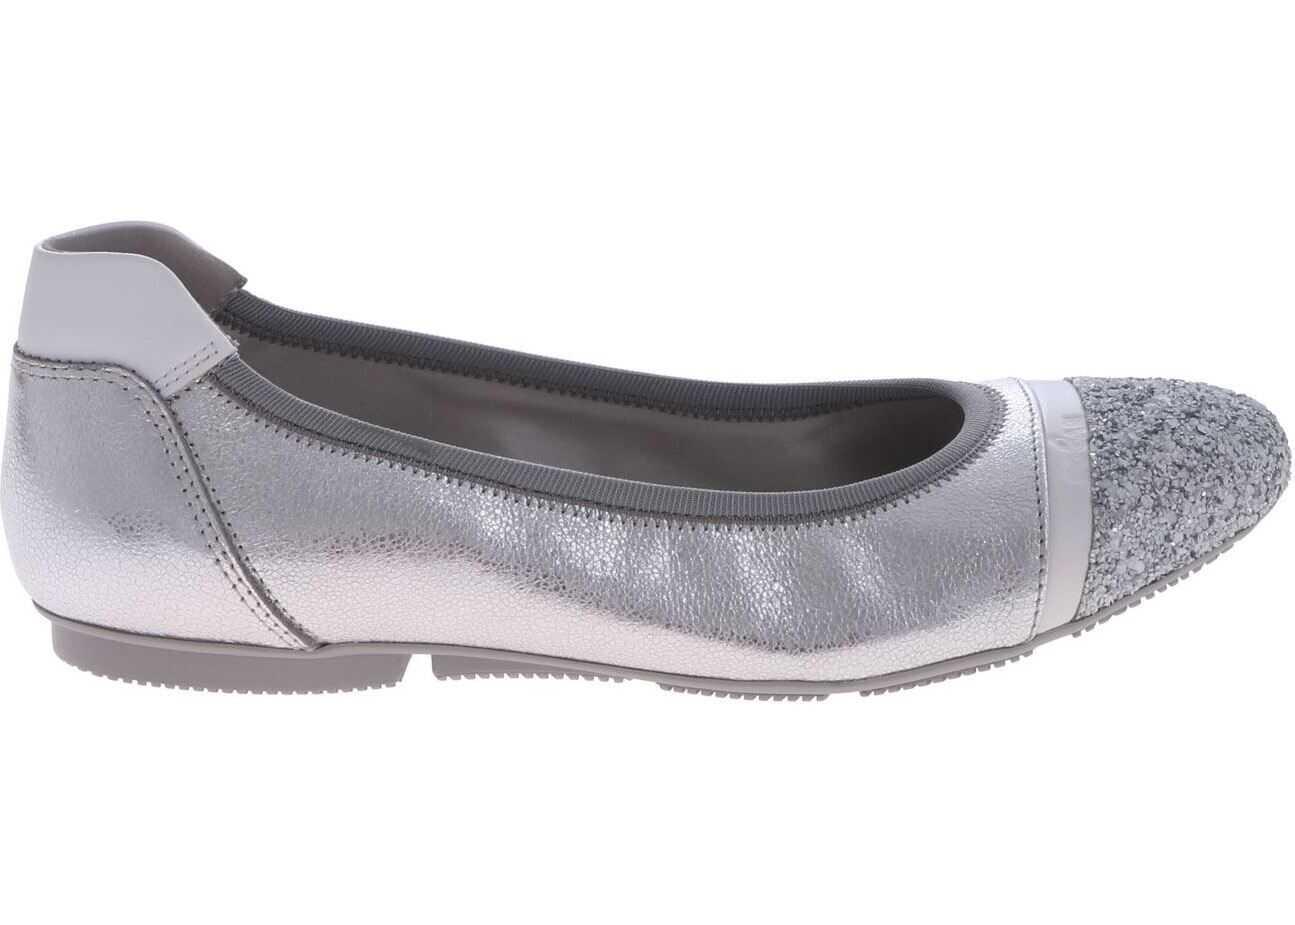 Hogan Wrap 144 Silver Flats Silver